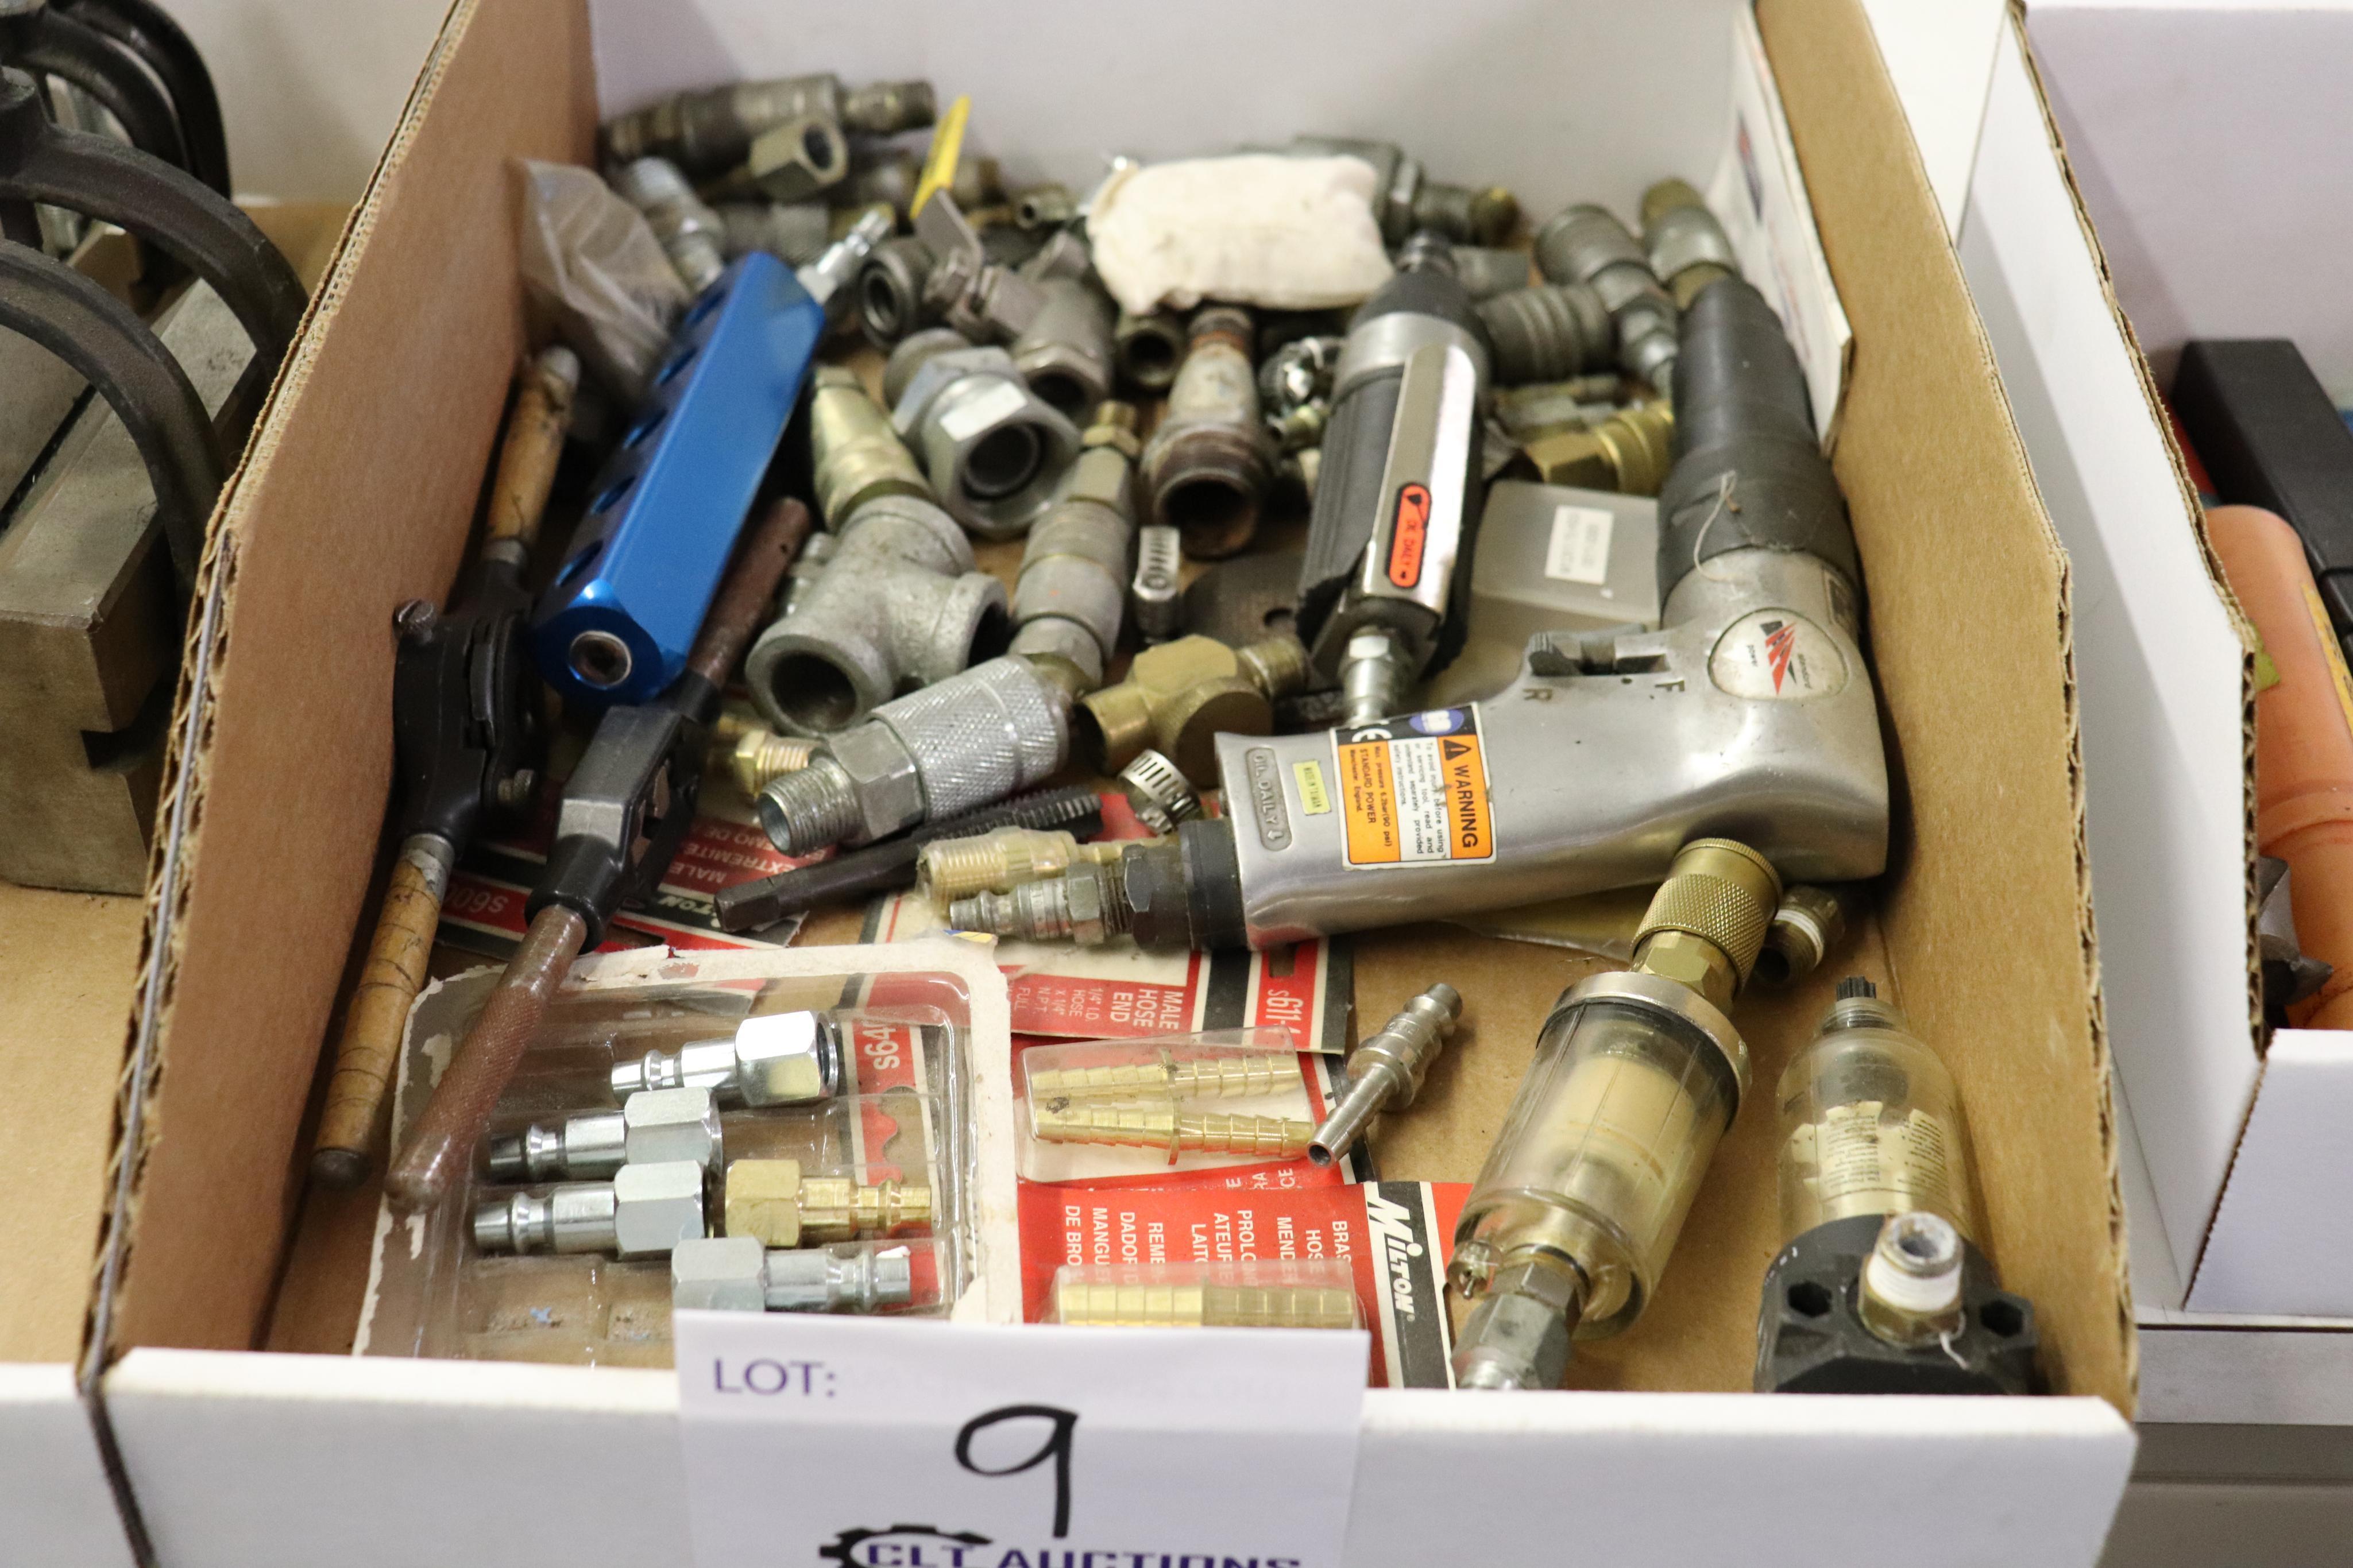 Pneumatic tools & accessories